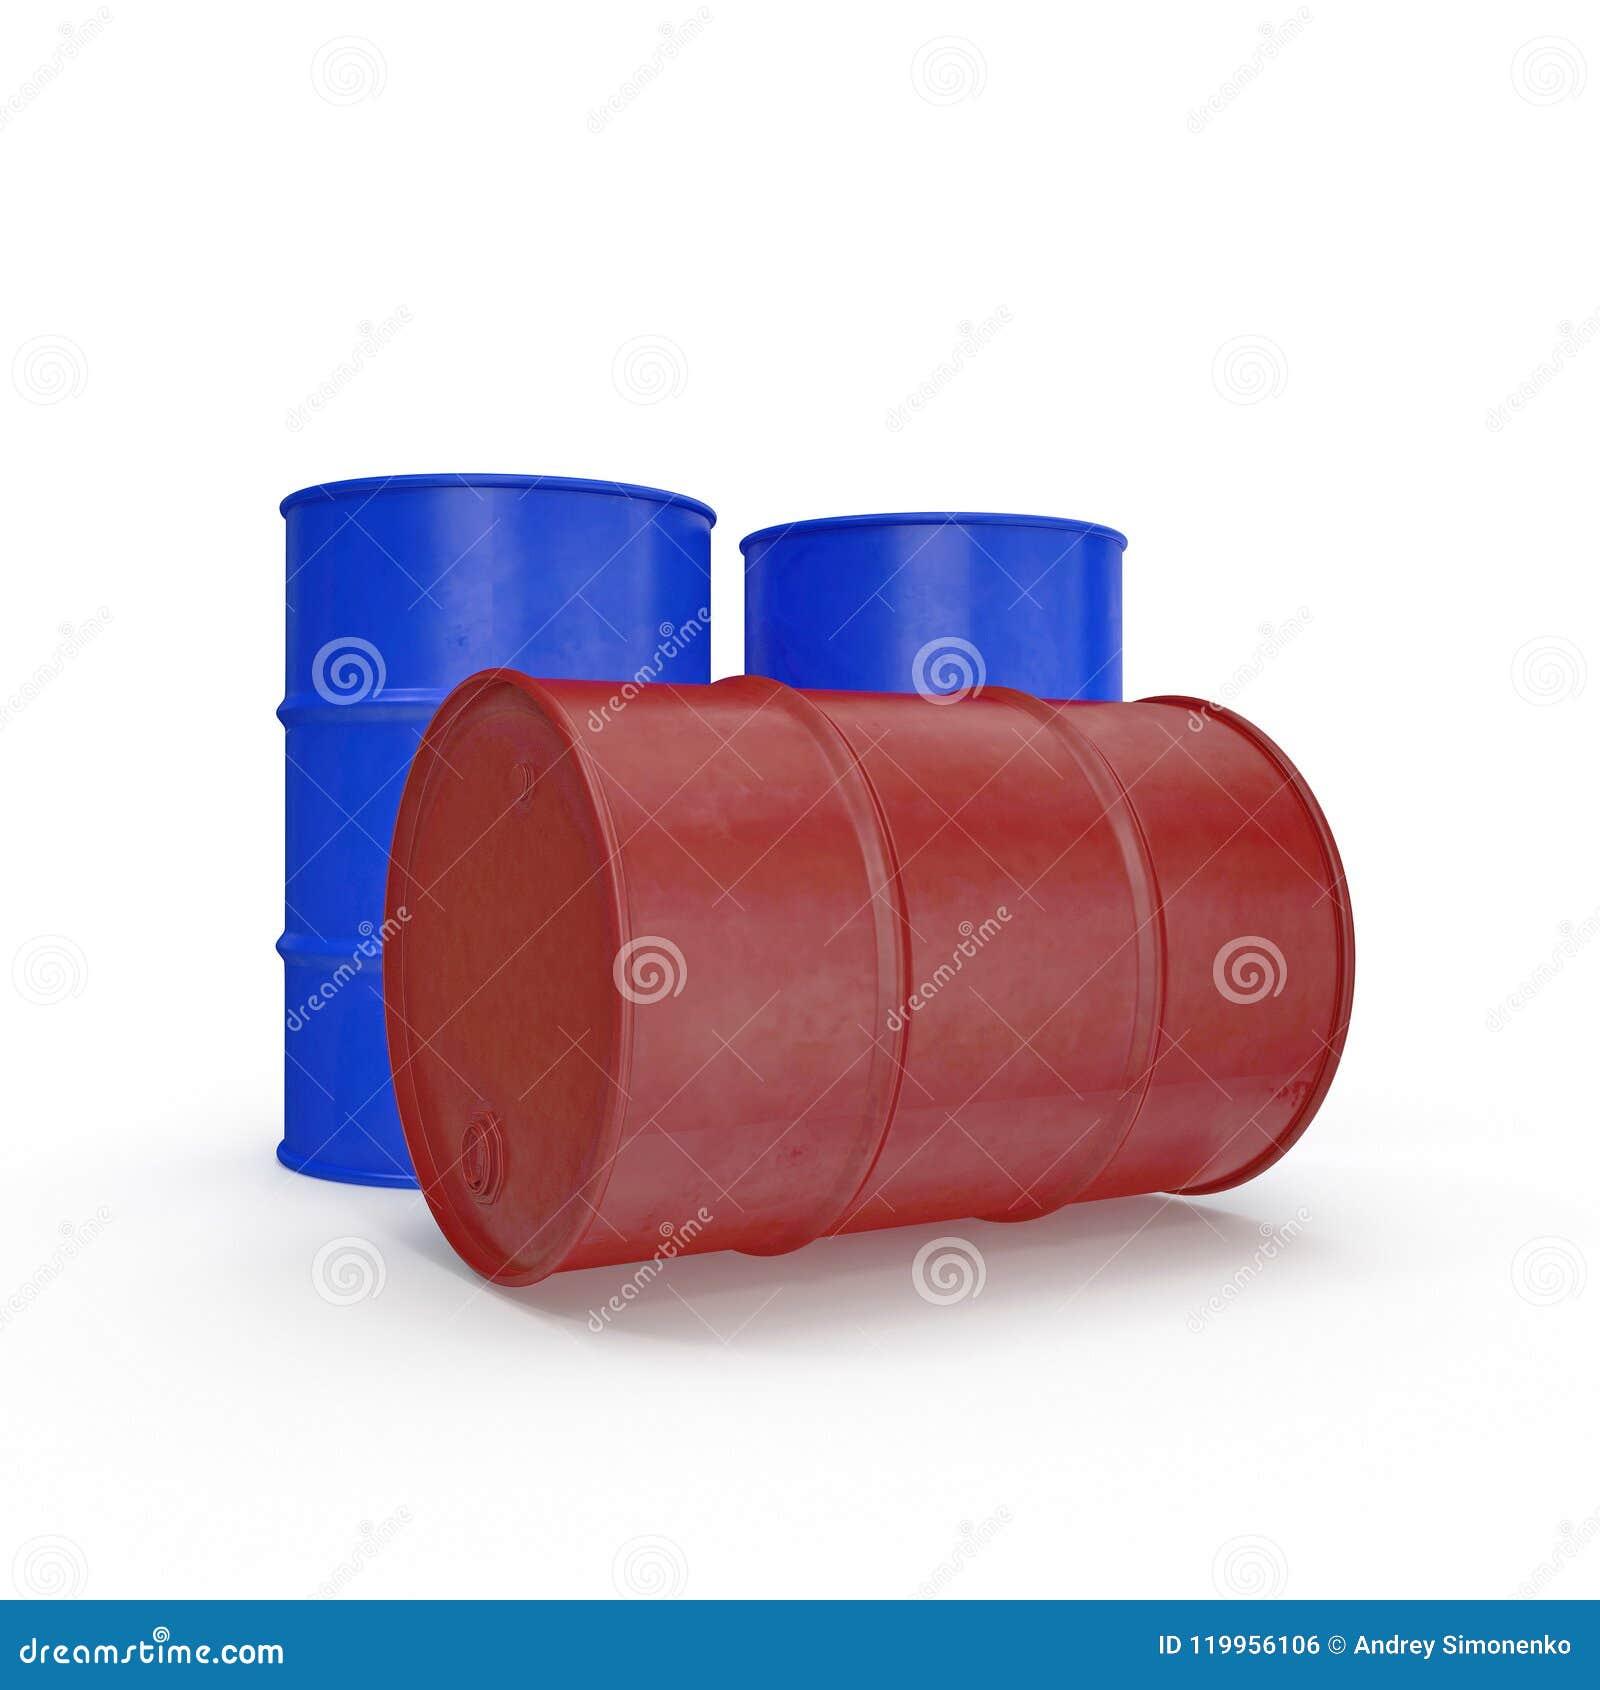 Oil barrels isolated on white. 3D illustration